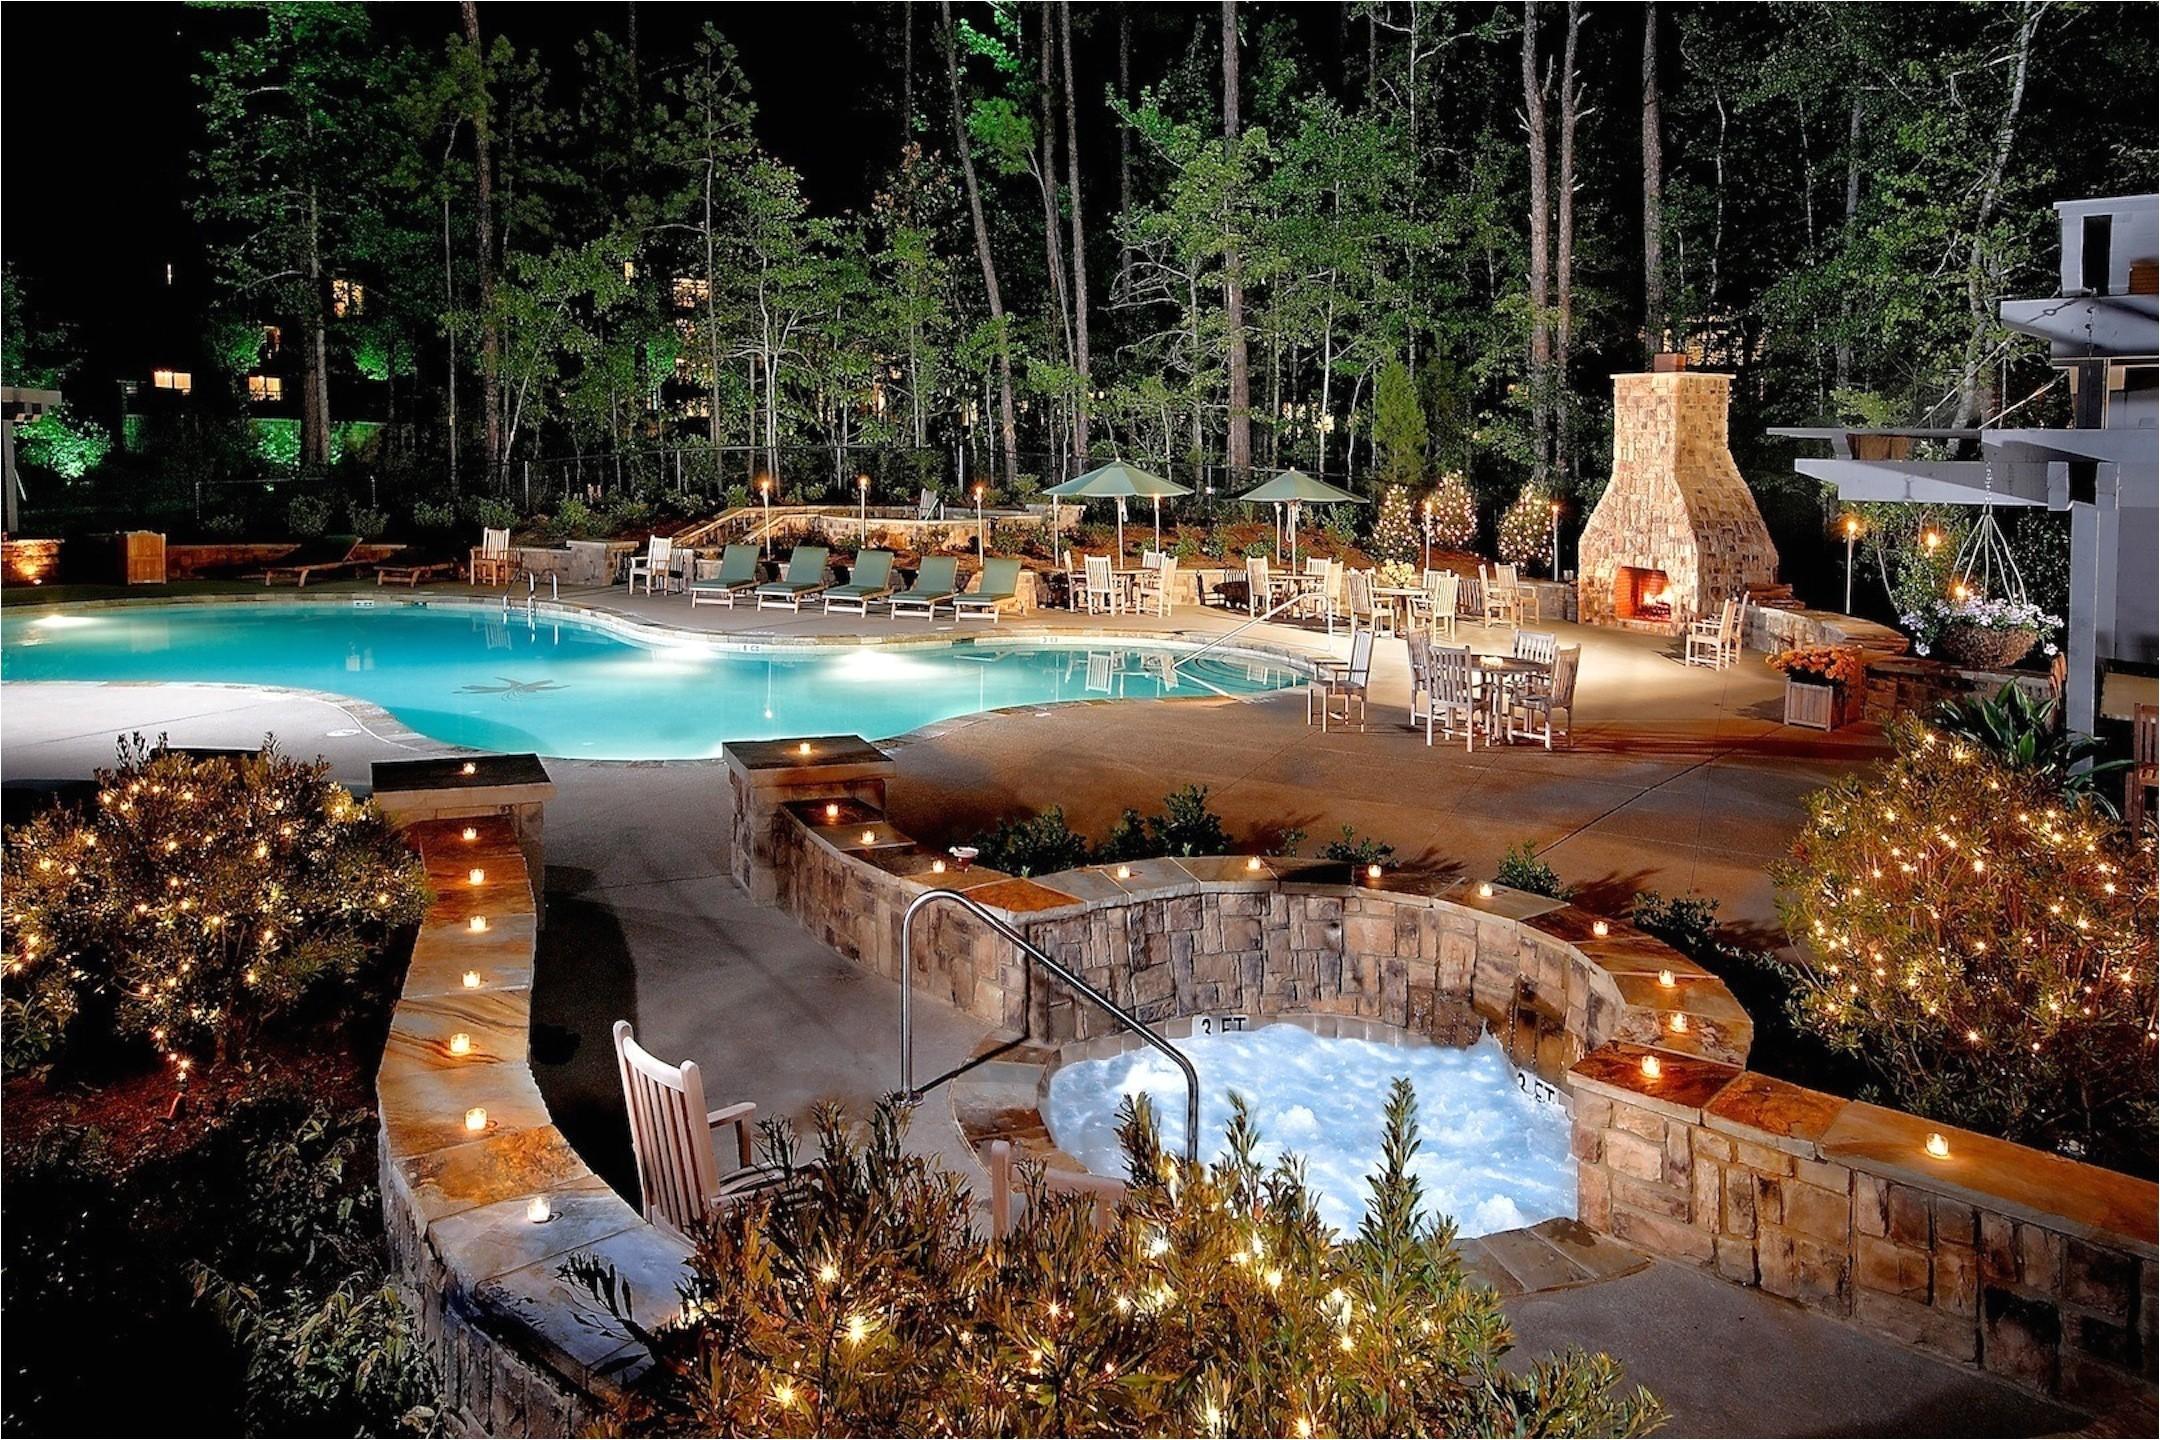 Callaway Garden Hotel Weekend Getaway the Lodge and Spa at Callaway Gardens Travelgirlmag